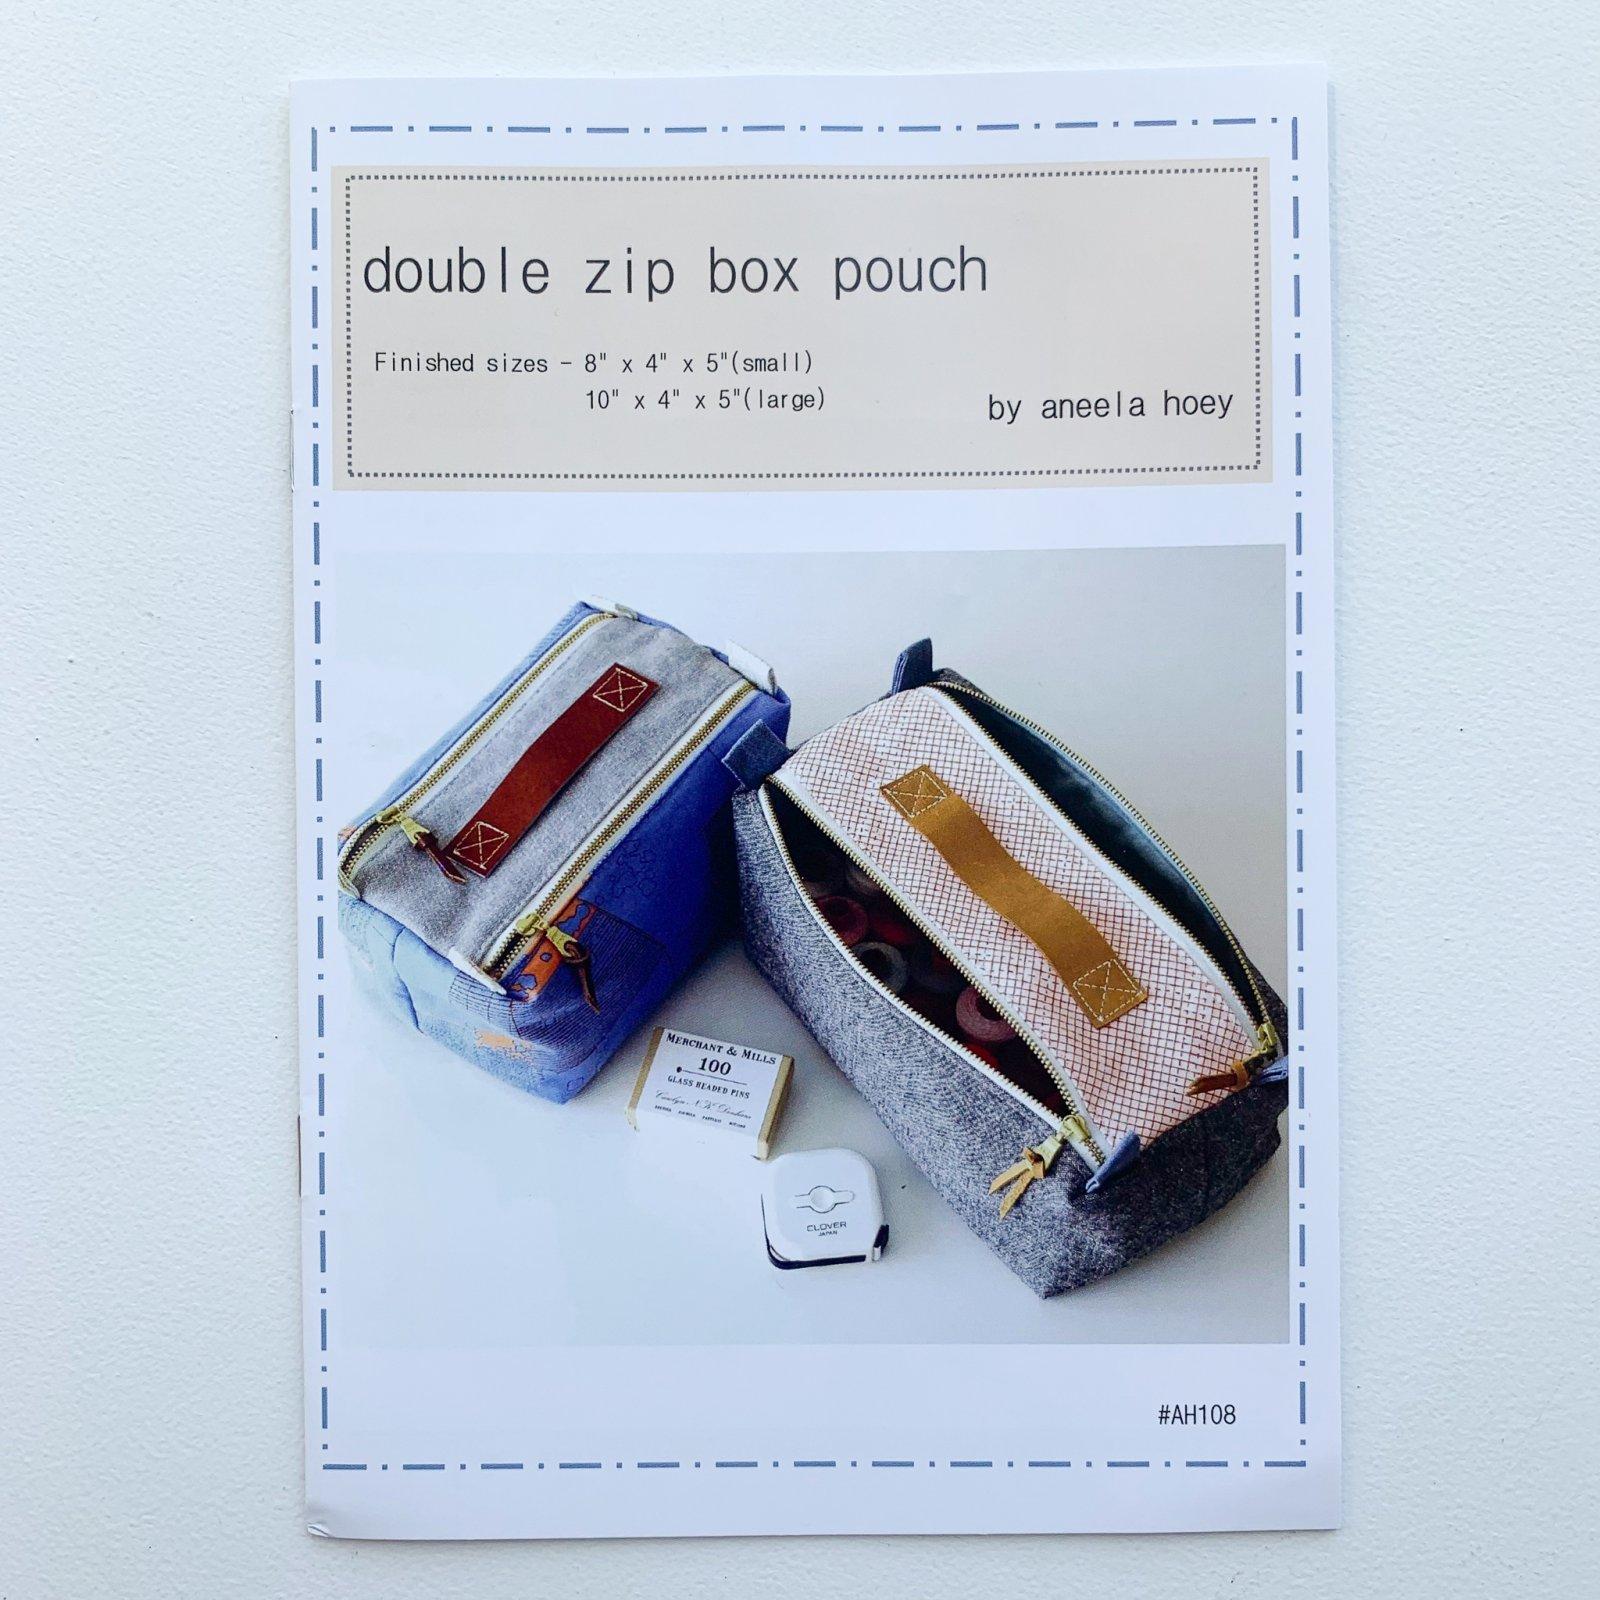 Aneela Hoey Double Zip Box Pouch Pattern